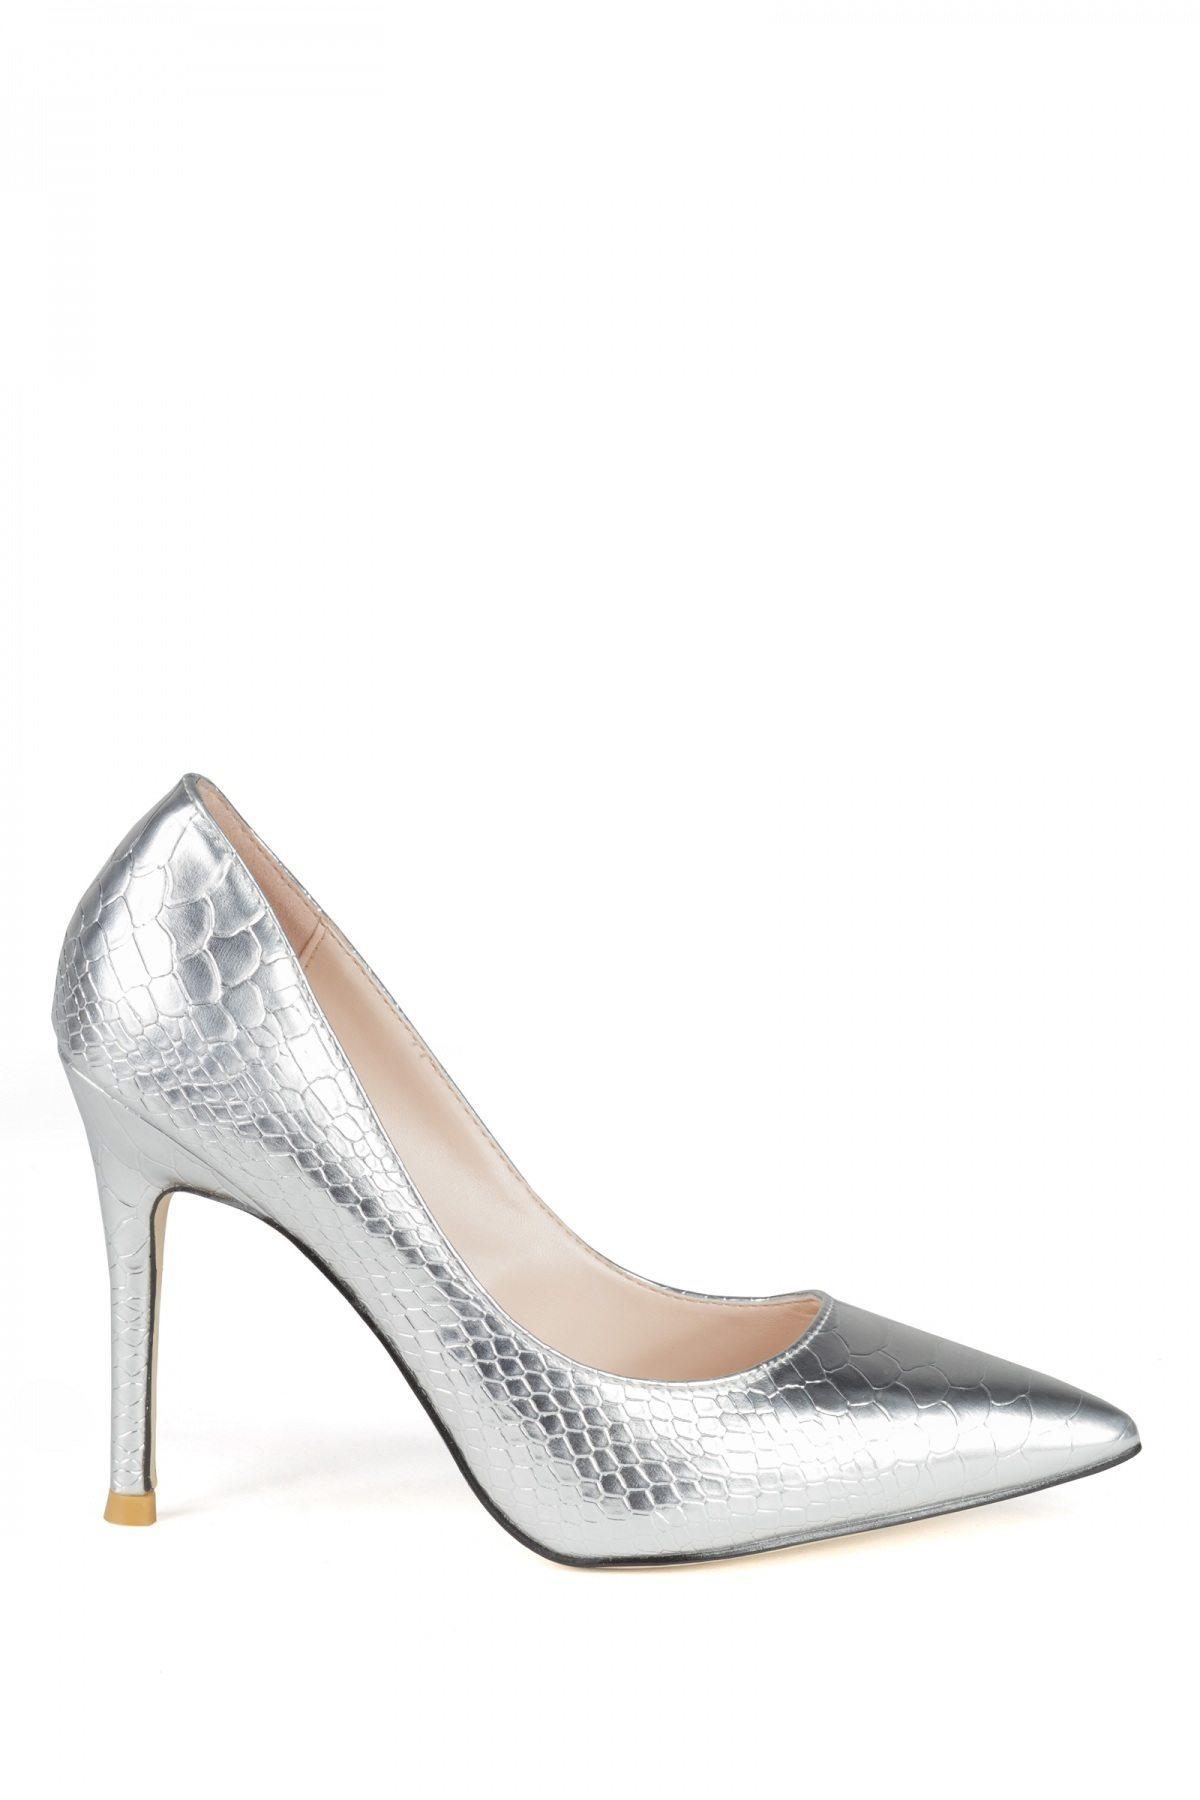 Pantofii stiletto argintii Argintiu